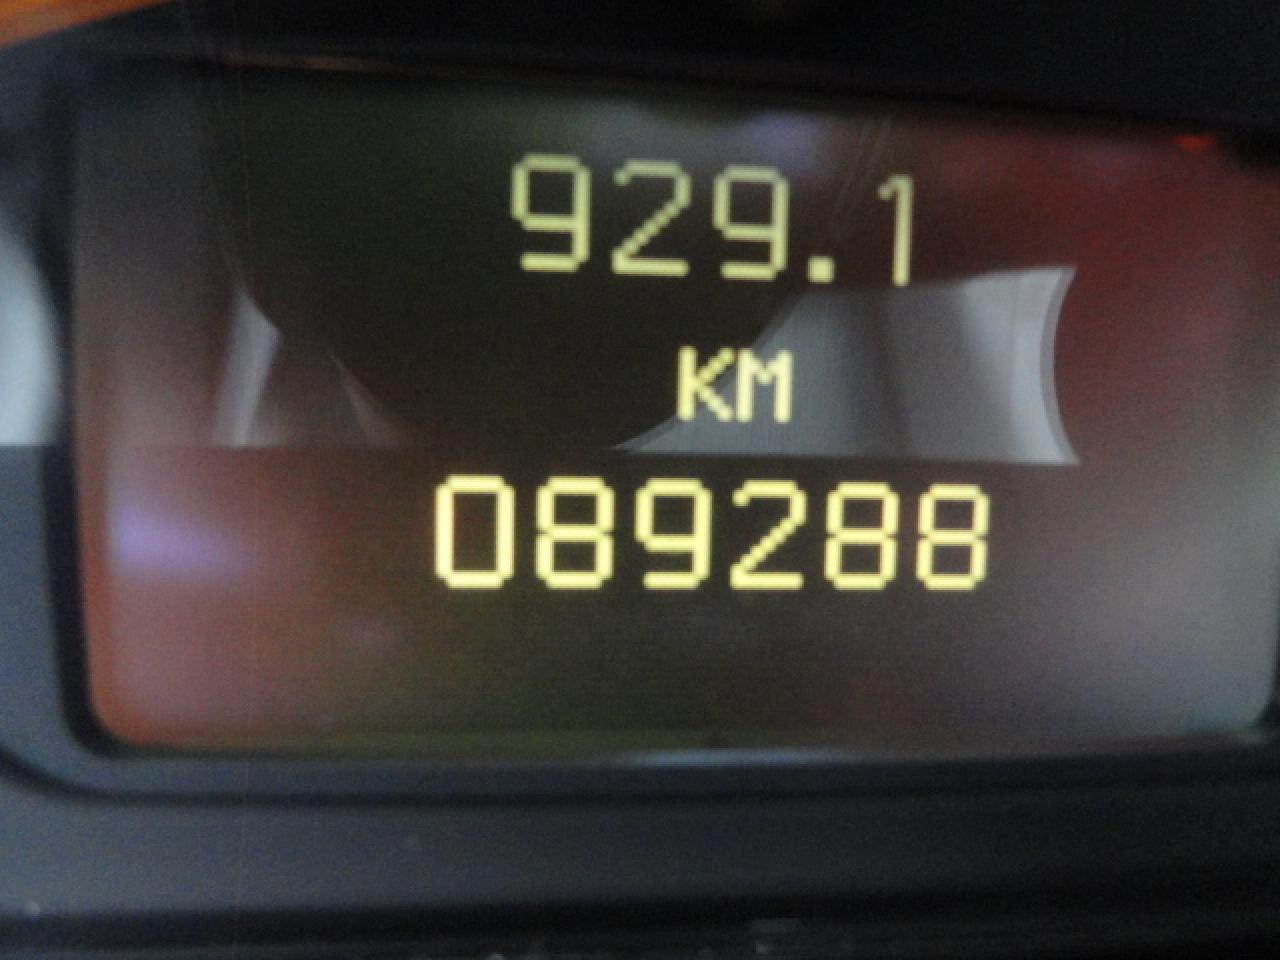 1896580